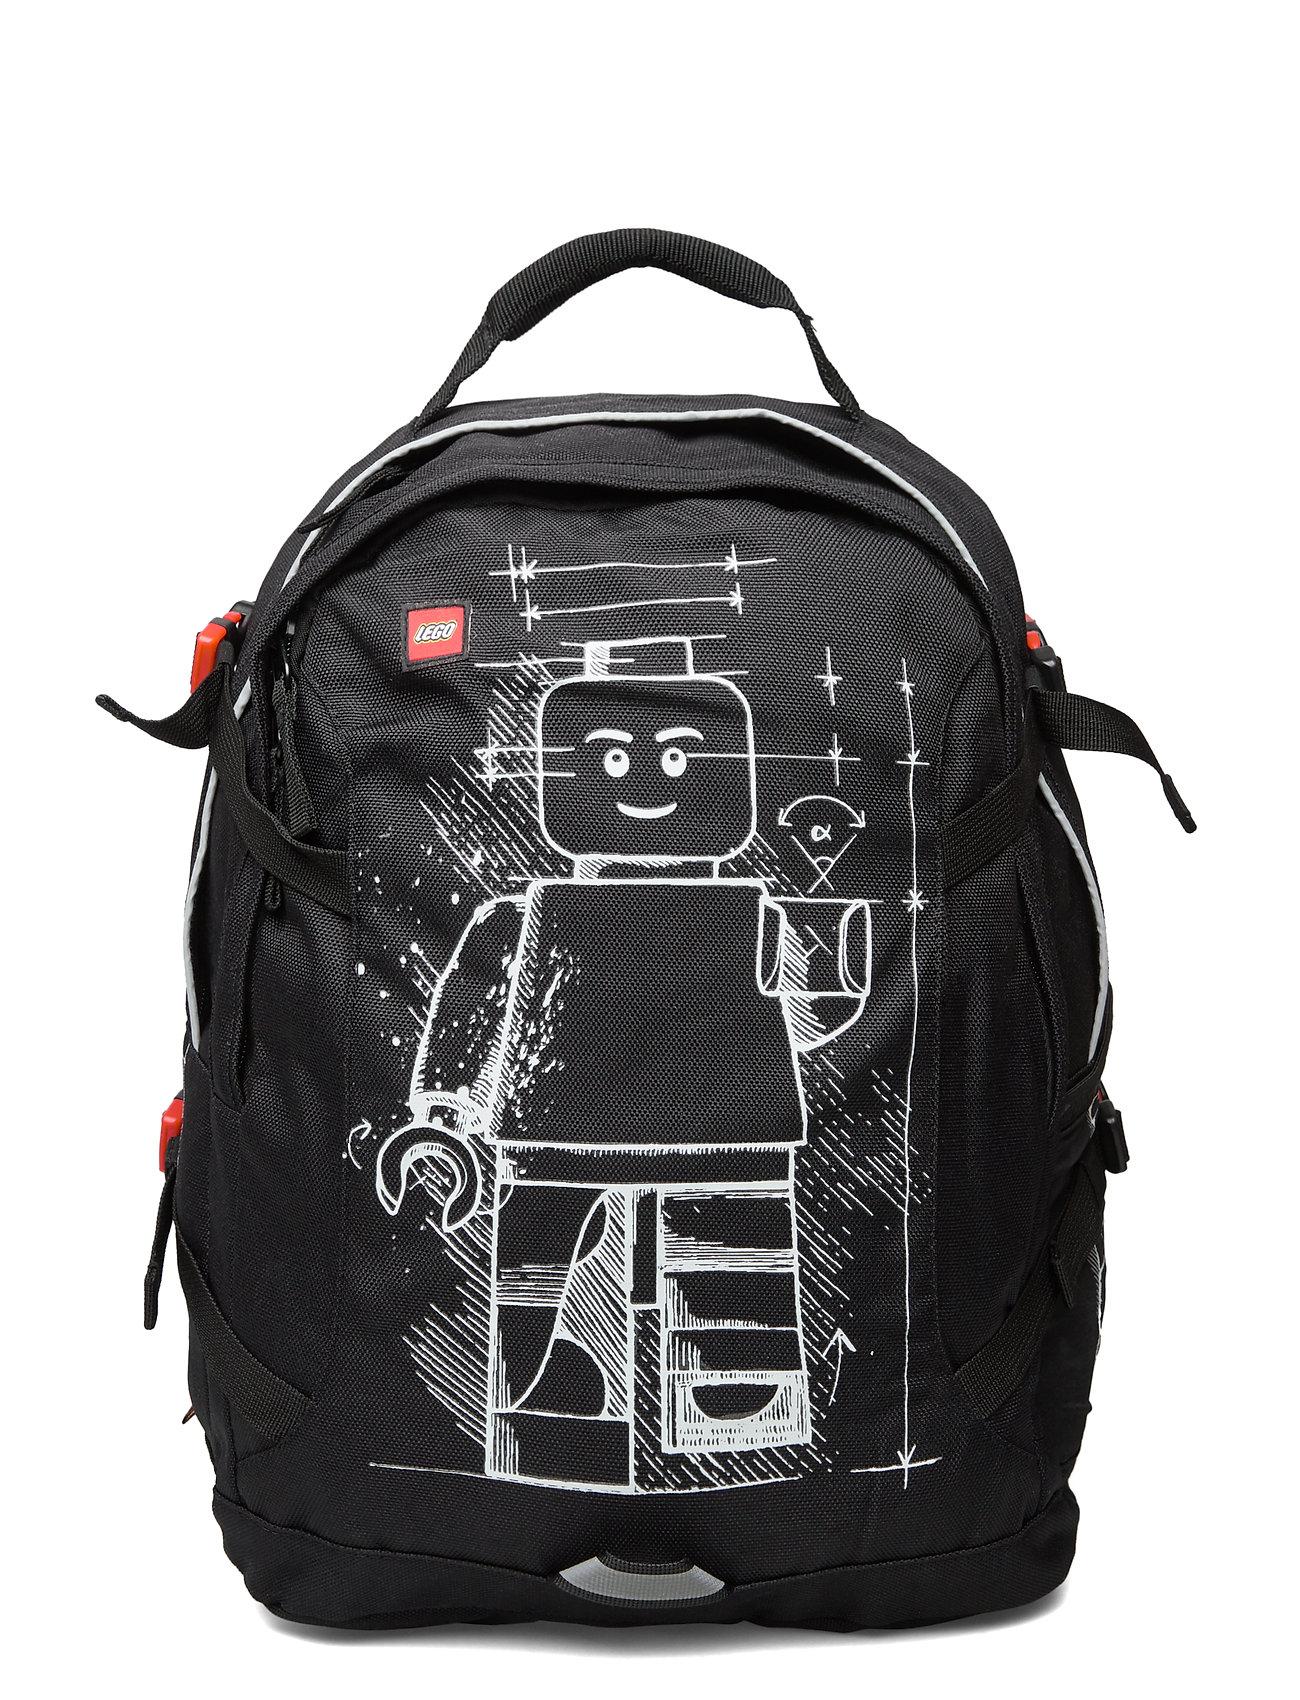 Lego Bags Backpack - MINIFIGURE